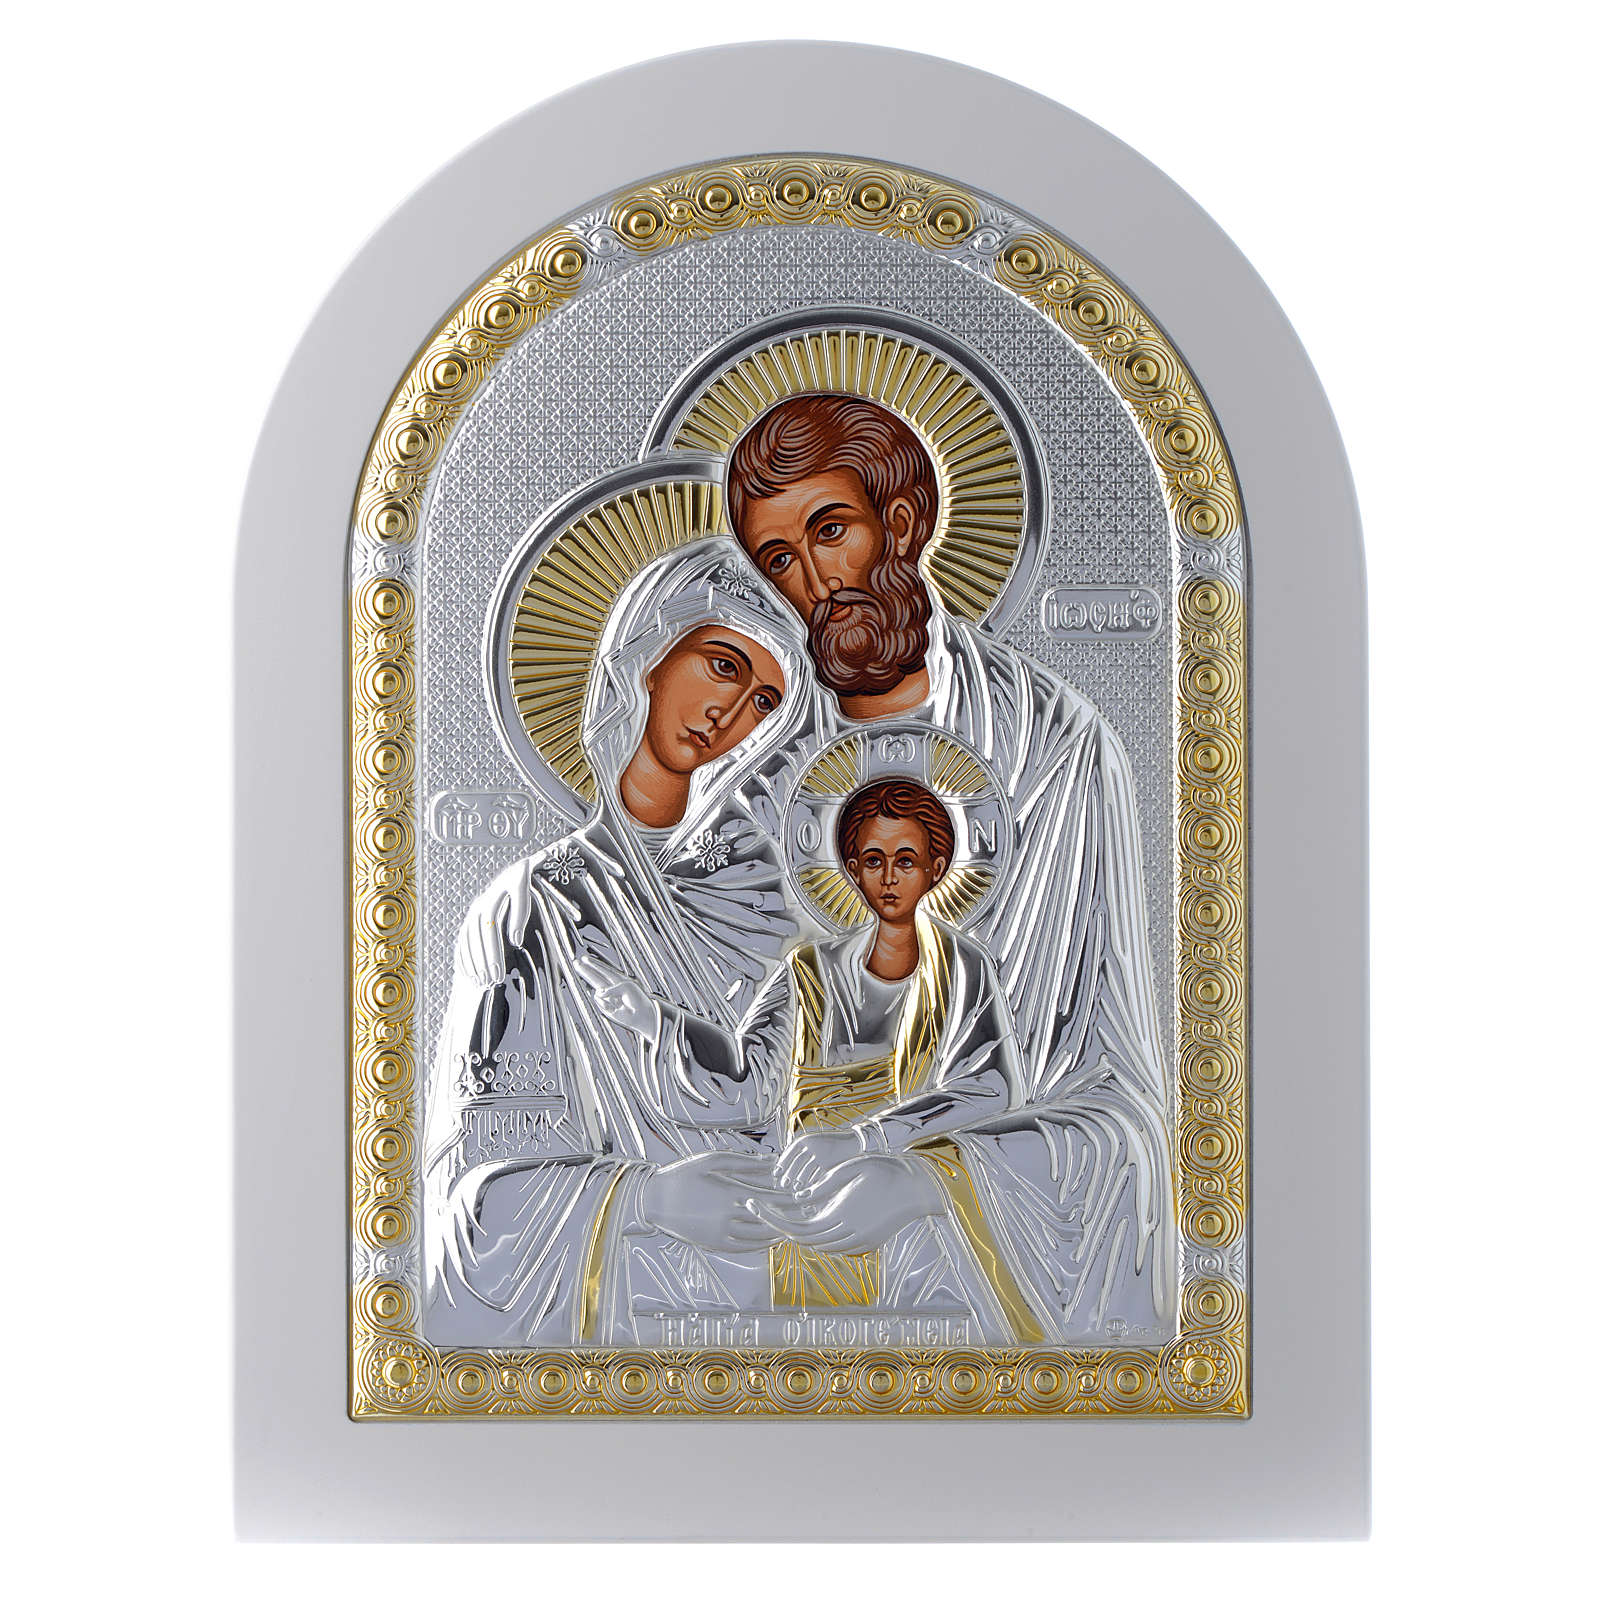 Icona Sacra Famiglia 24x18 cm argento 925 finiture dorate 4